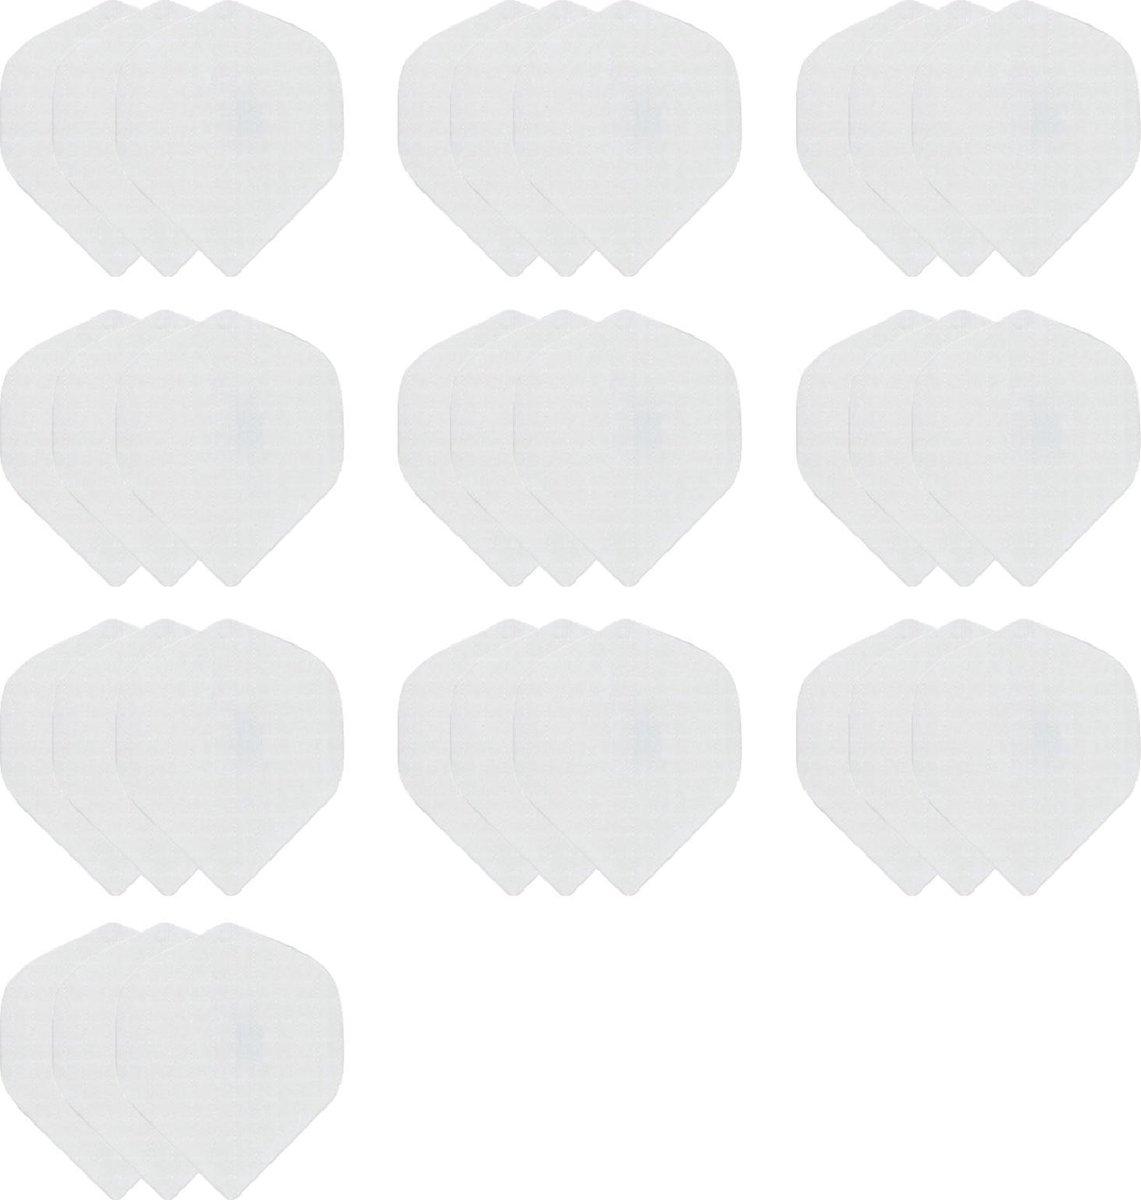 deDartshop 10 Sets (30 stuks) Dragon Poly - dart flights - Multipack - Wit - darts flights